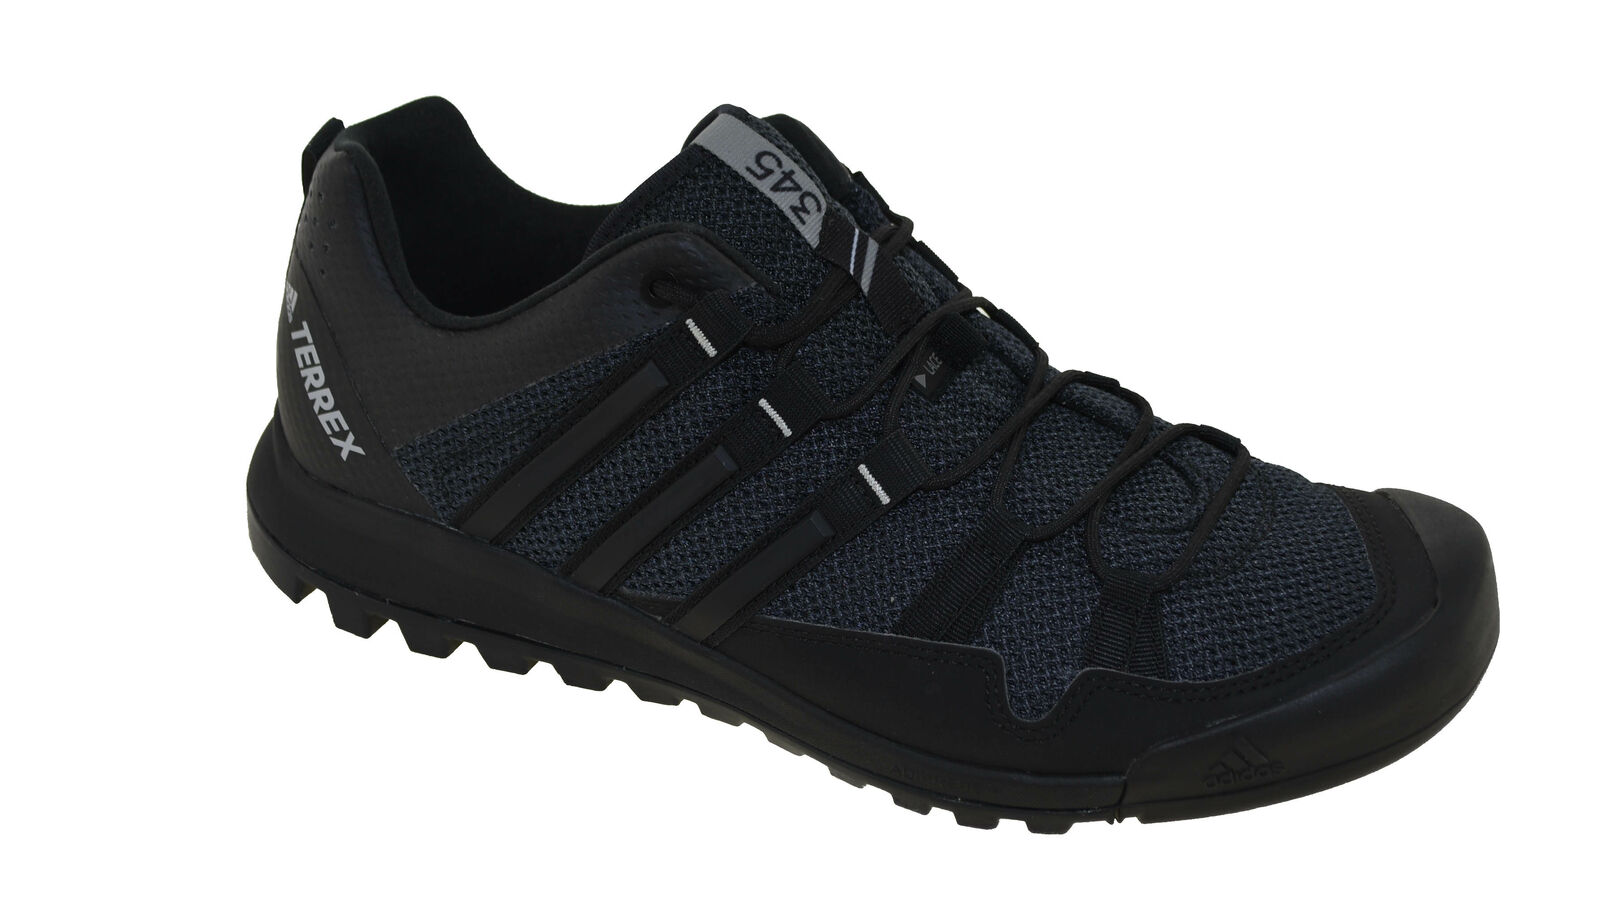 Unity Lime BB5563 Black Blue Adidas Men/'s Outdoor Terrex Solo Shoes